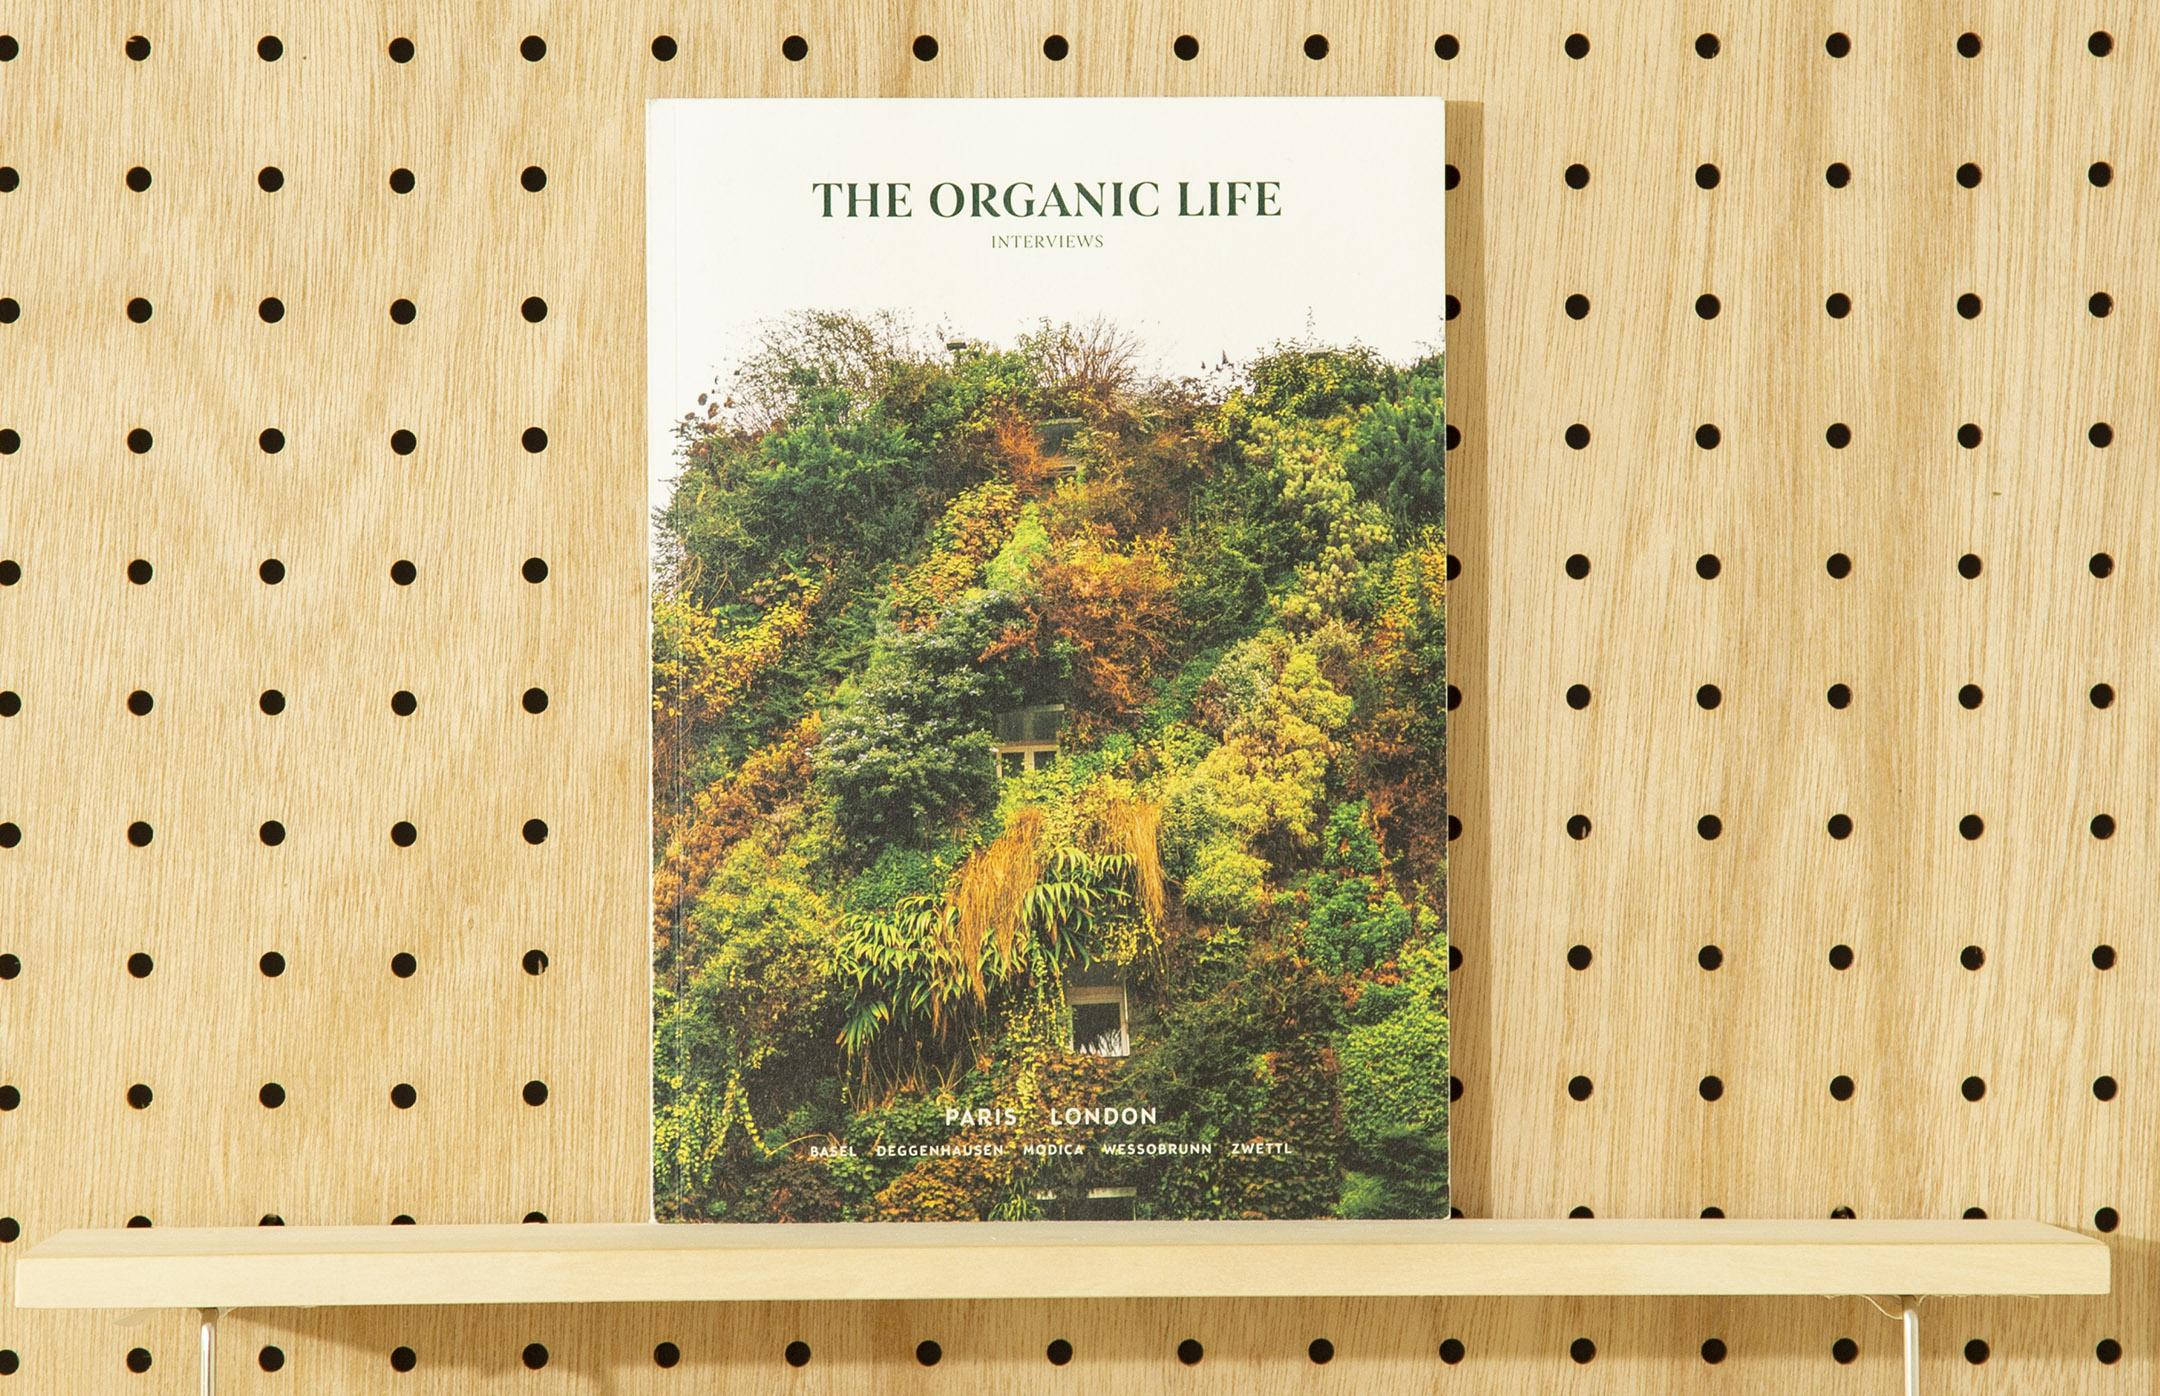 THE ORGANIC LIFE  INTERVIEWS